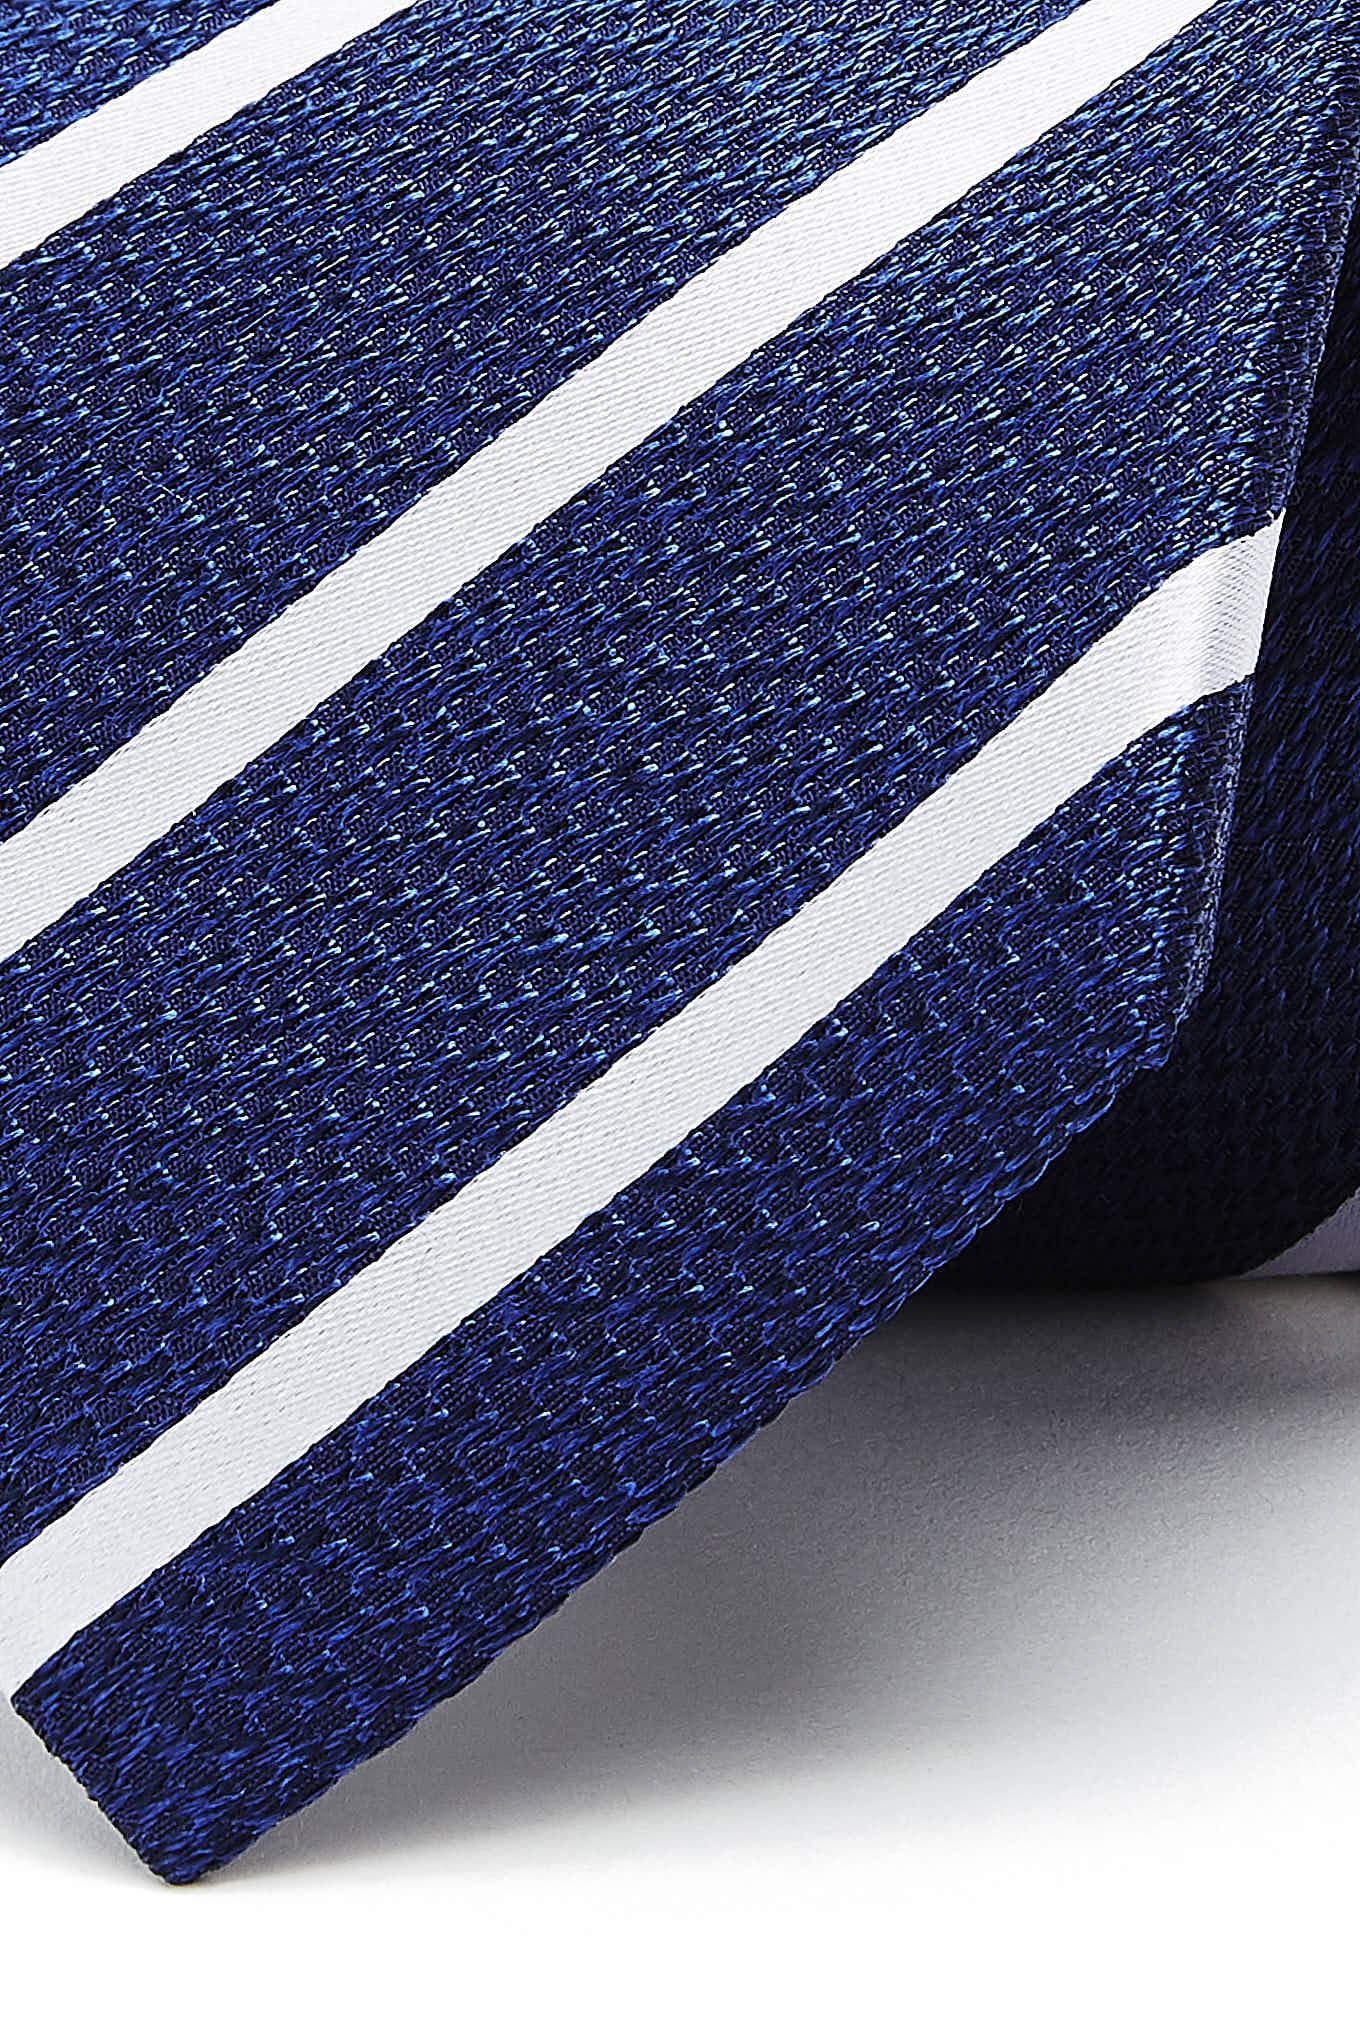 Gravata Azul Escuro Classic Homem